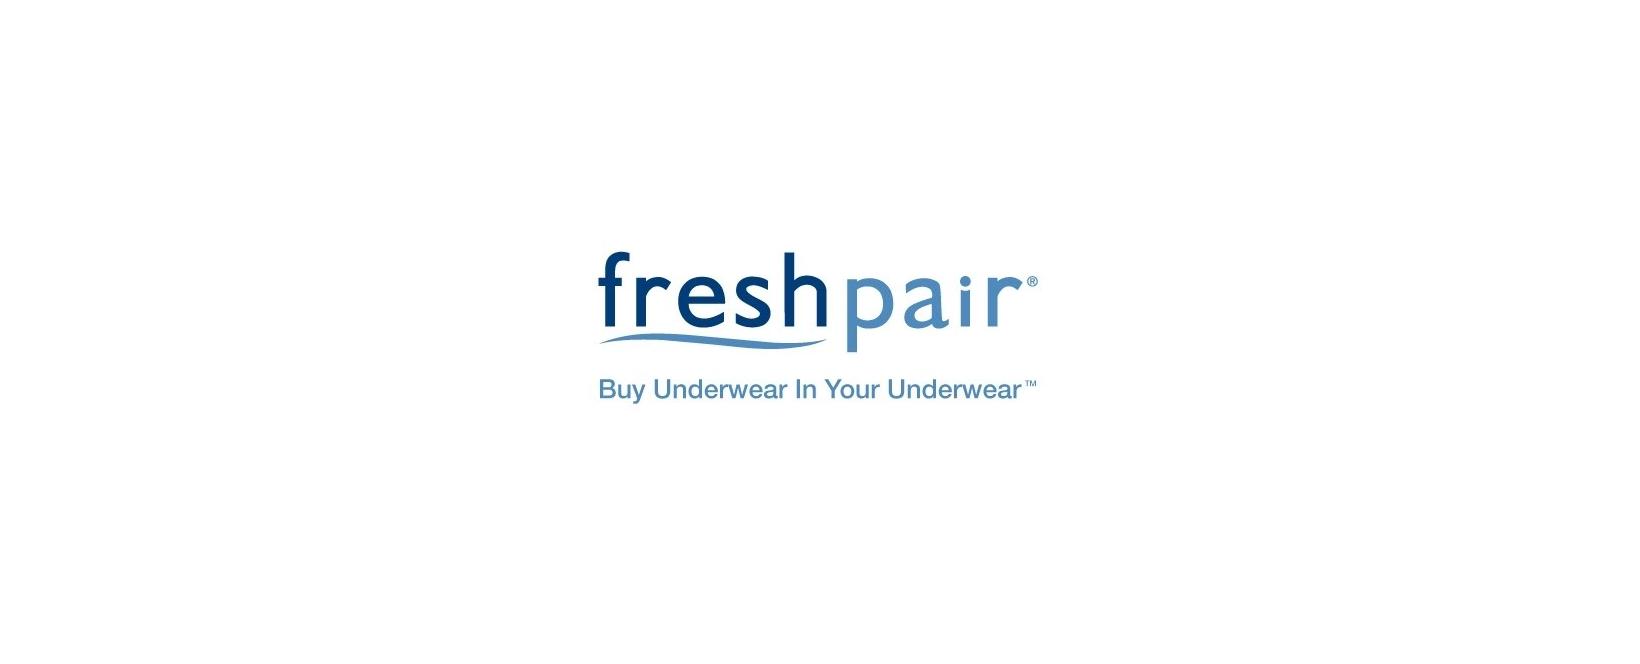 freshpair Coupon Code 2021